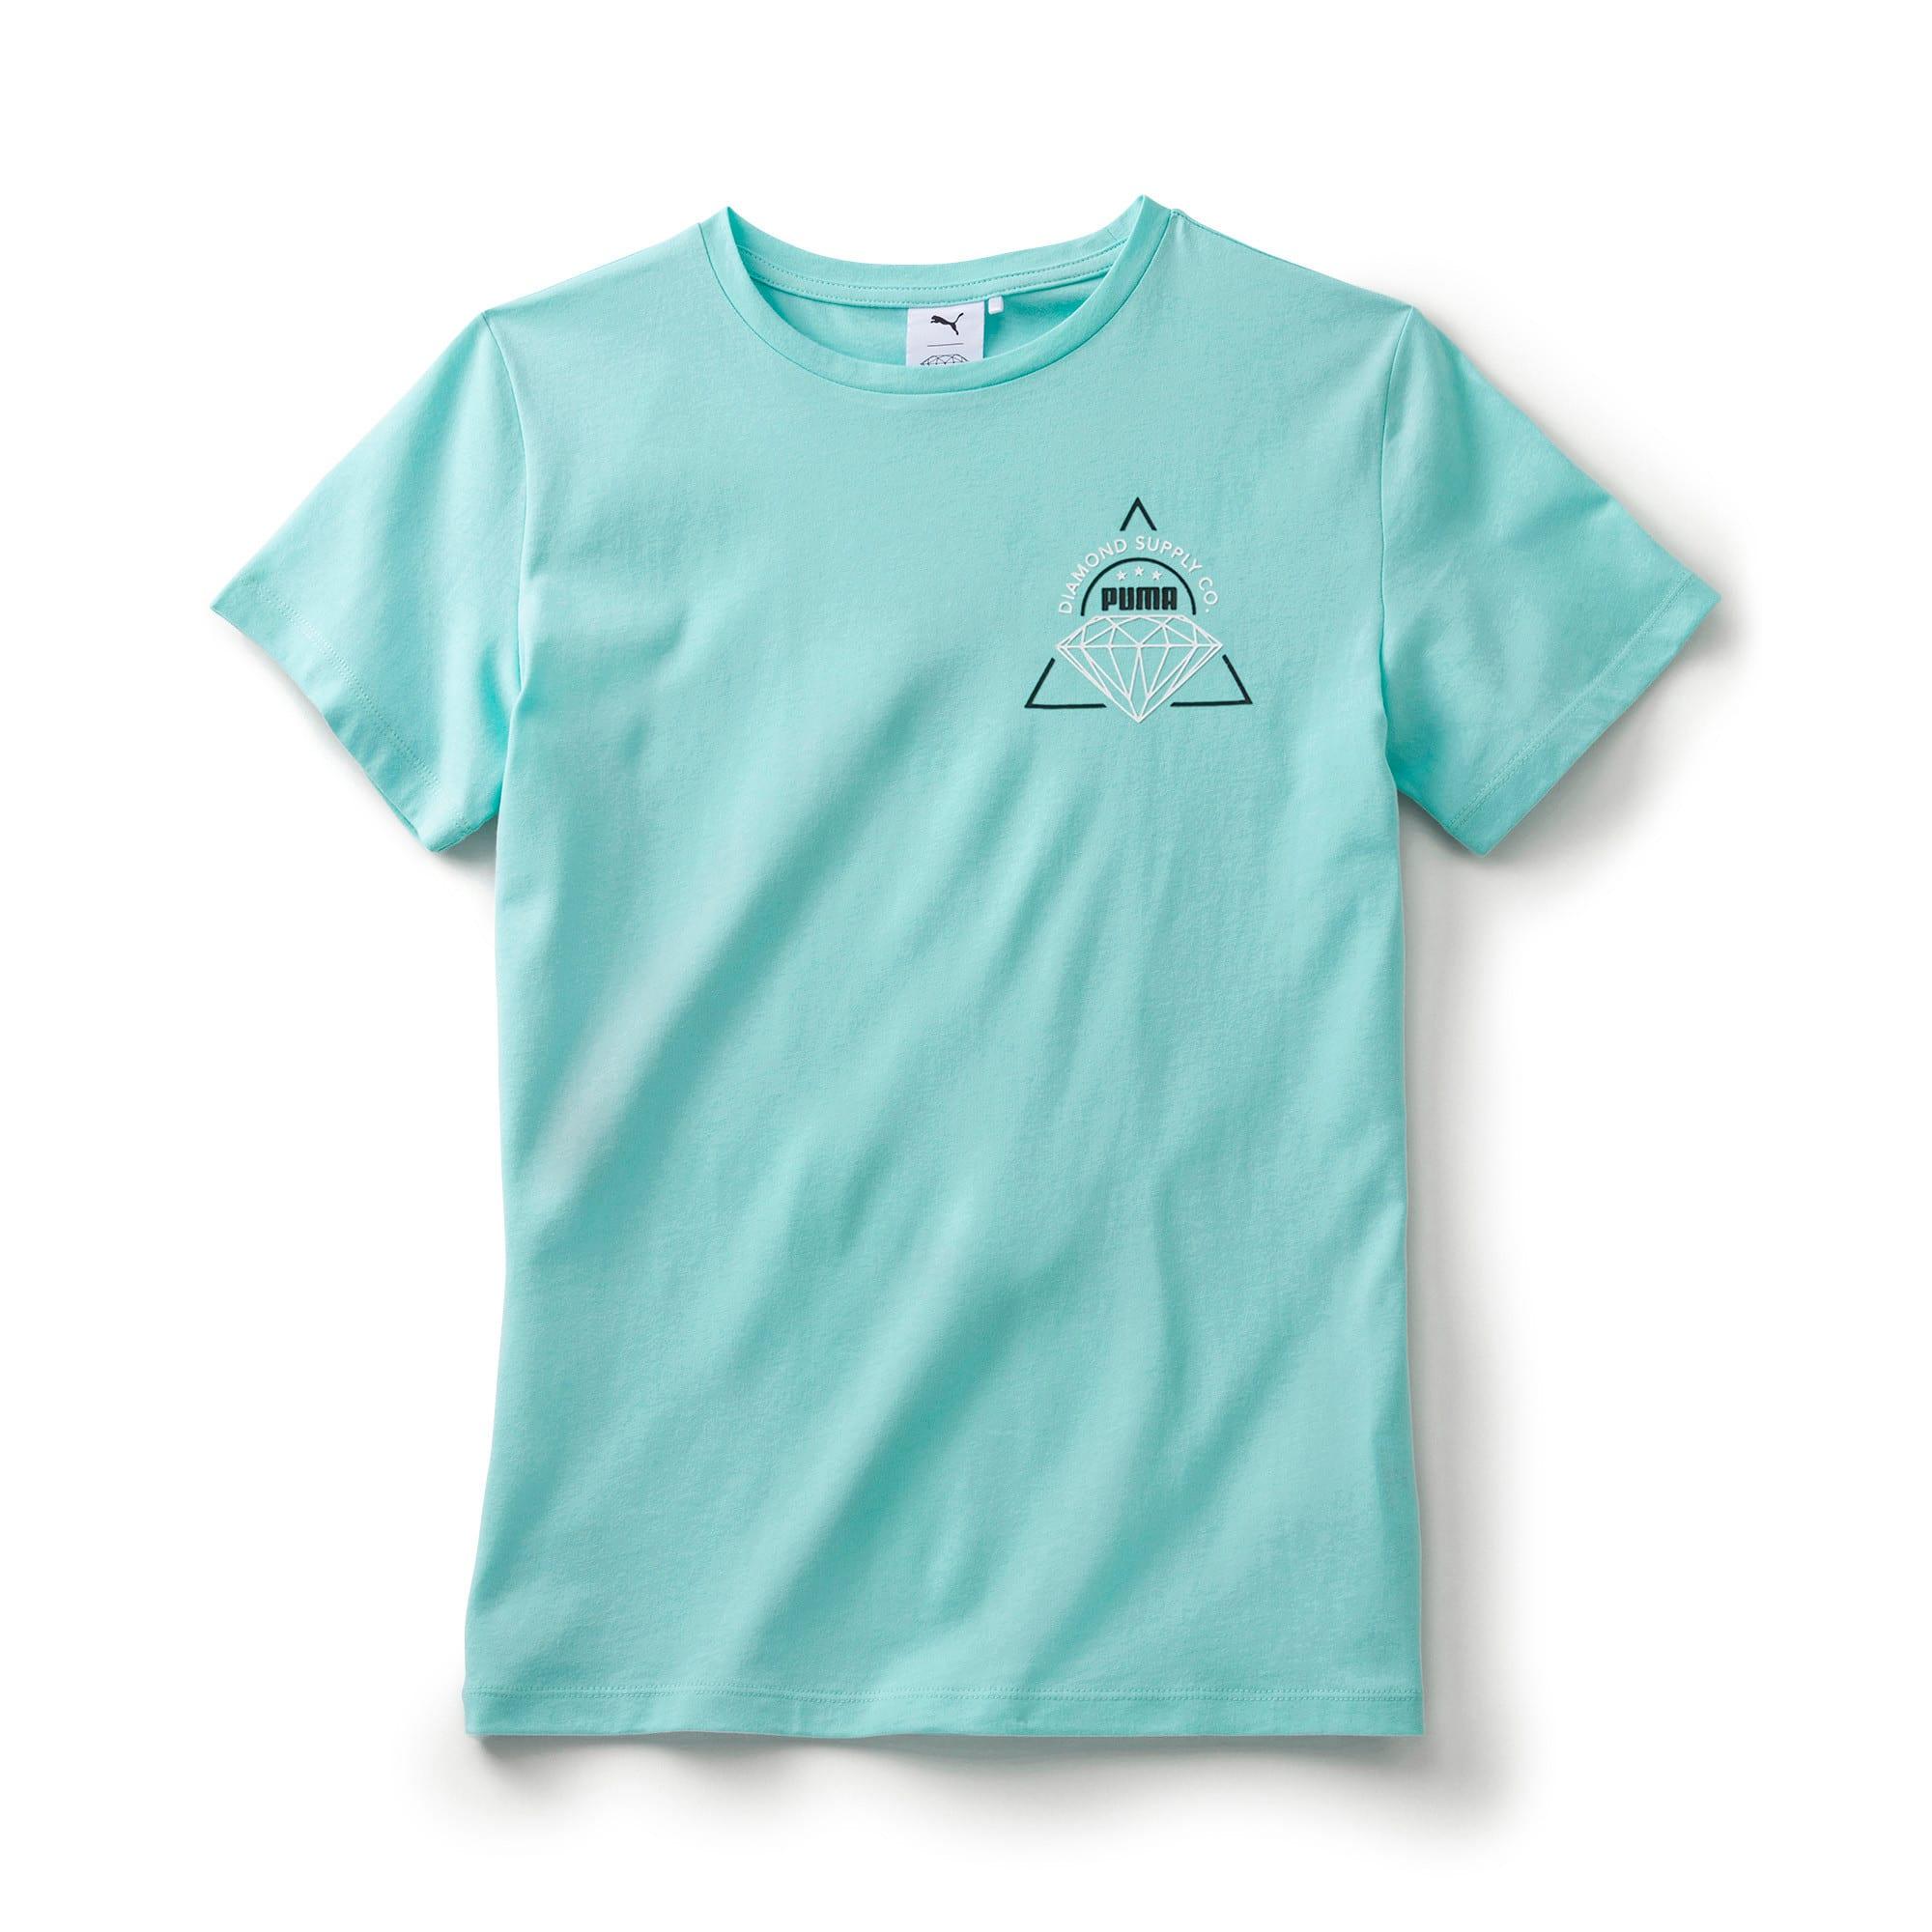 Thumbnail 1 of キッズ PUMA x DIAMOND Tシャツ, ARUBA BLUE, medium-JPN